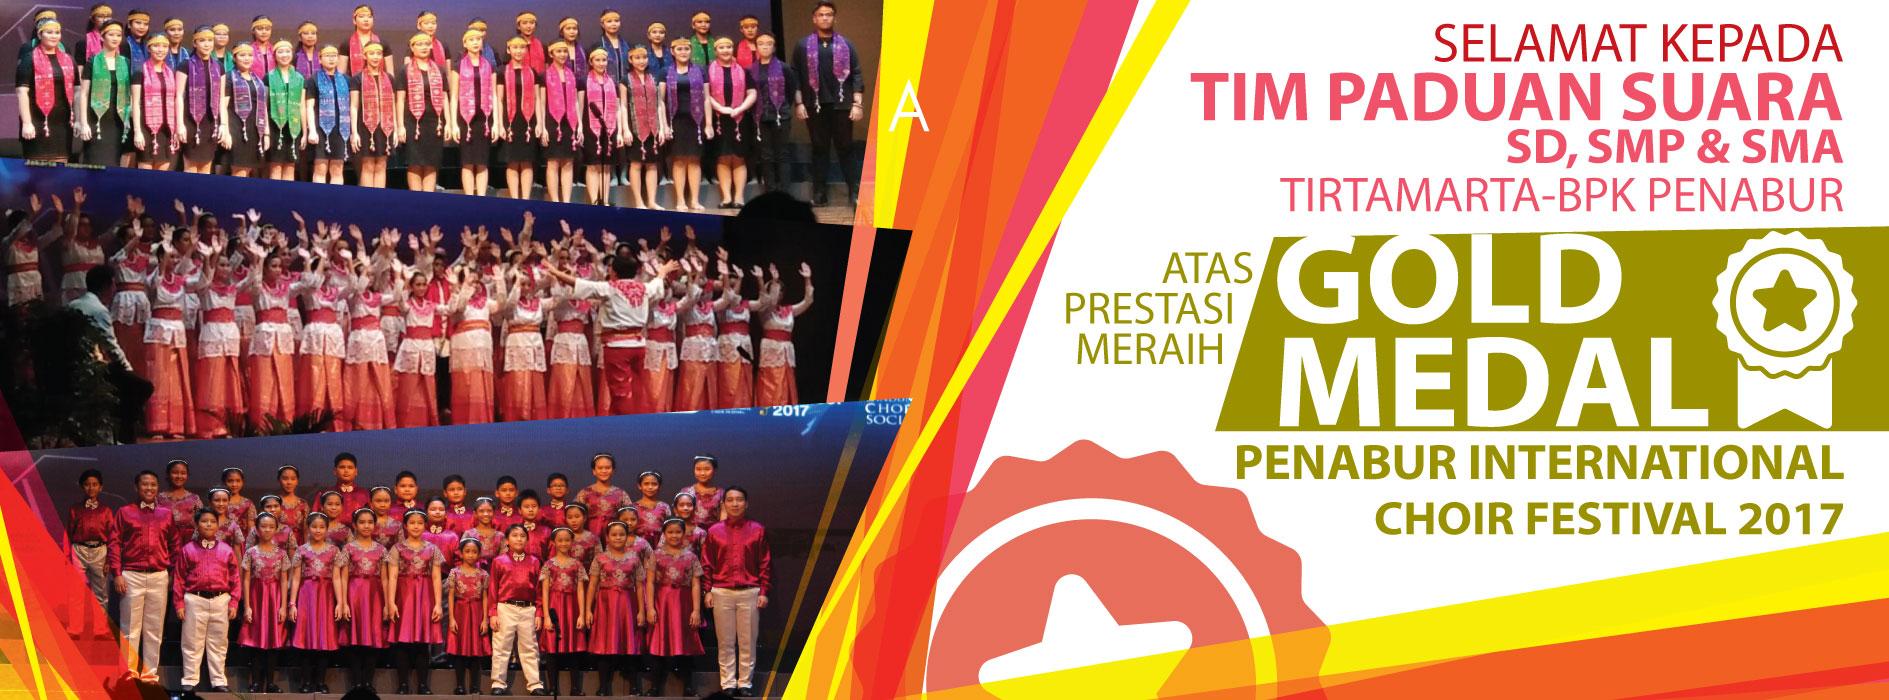 Selamat SD SMP SMA Sekolah Tirtamarta BPK Penabur Gold Medal Penabur International Choir Festival 2017